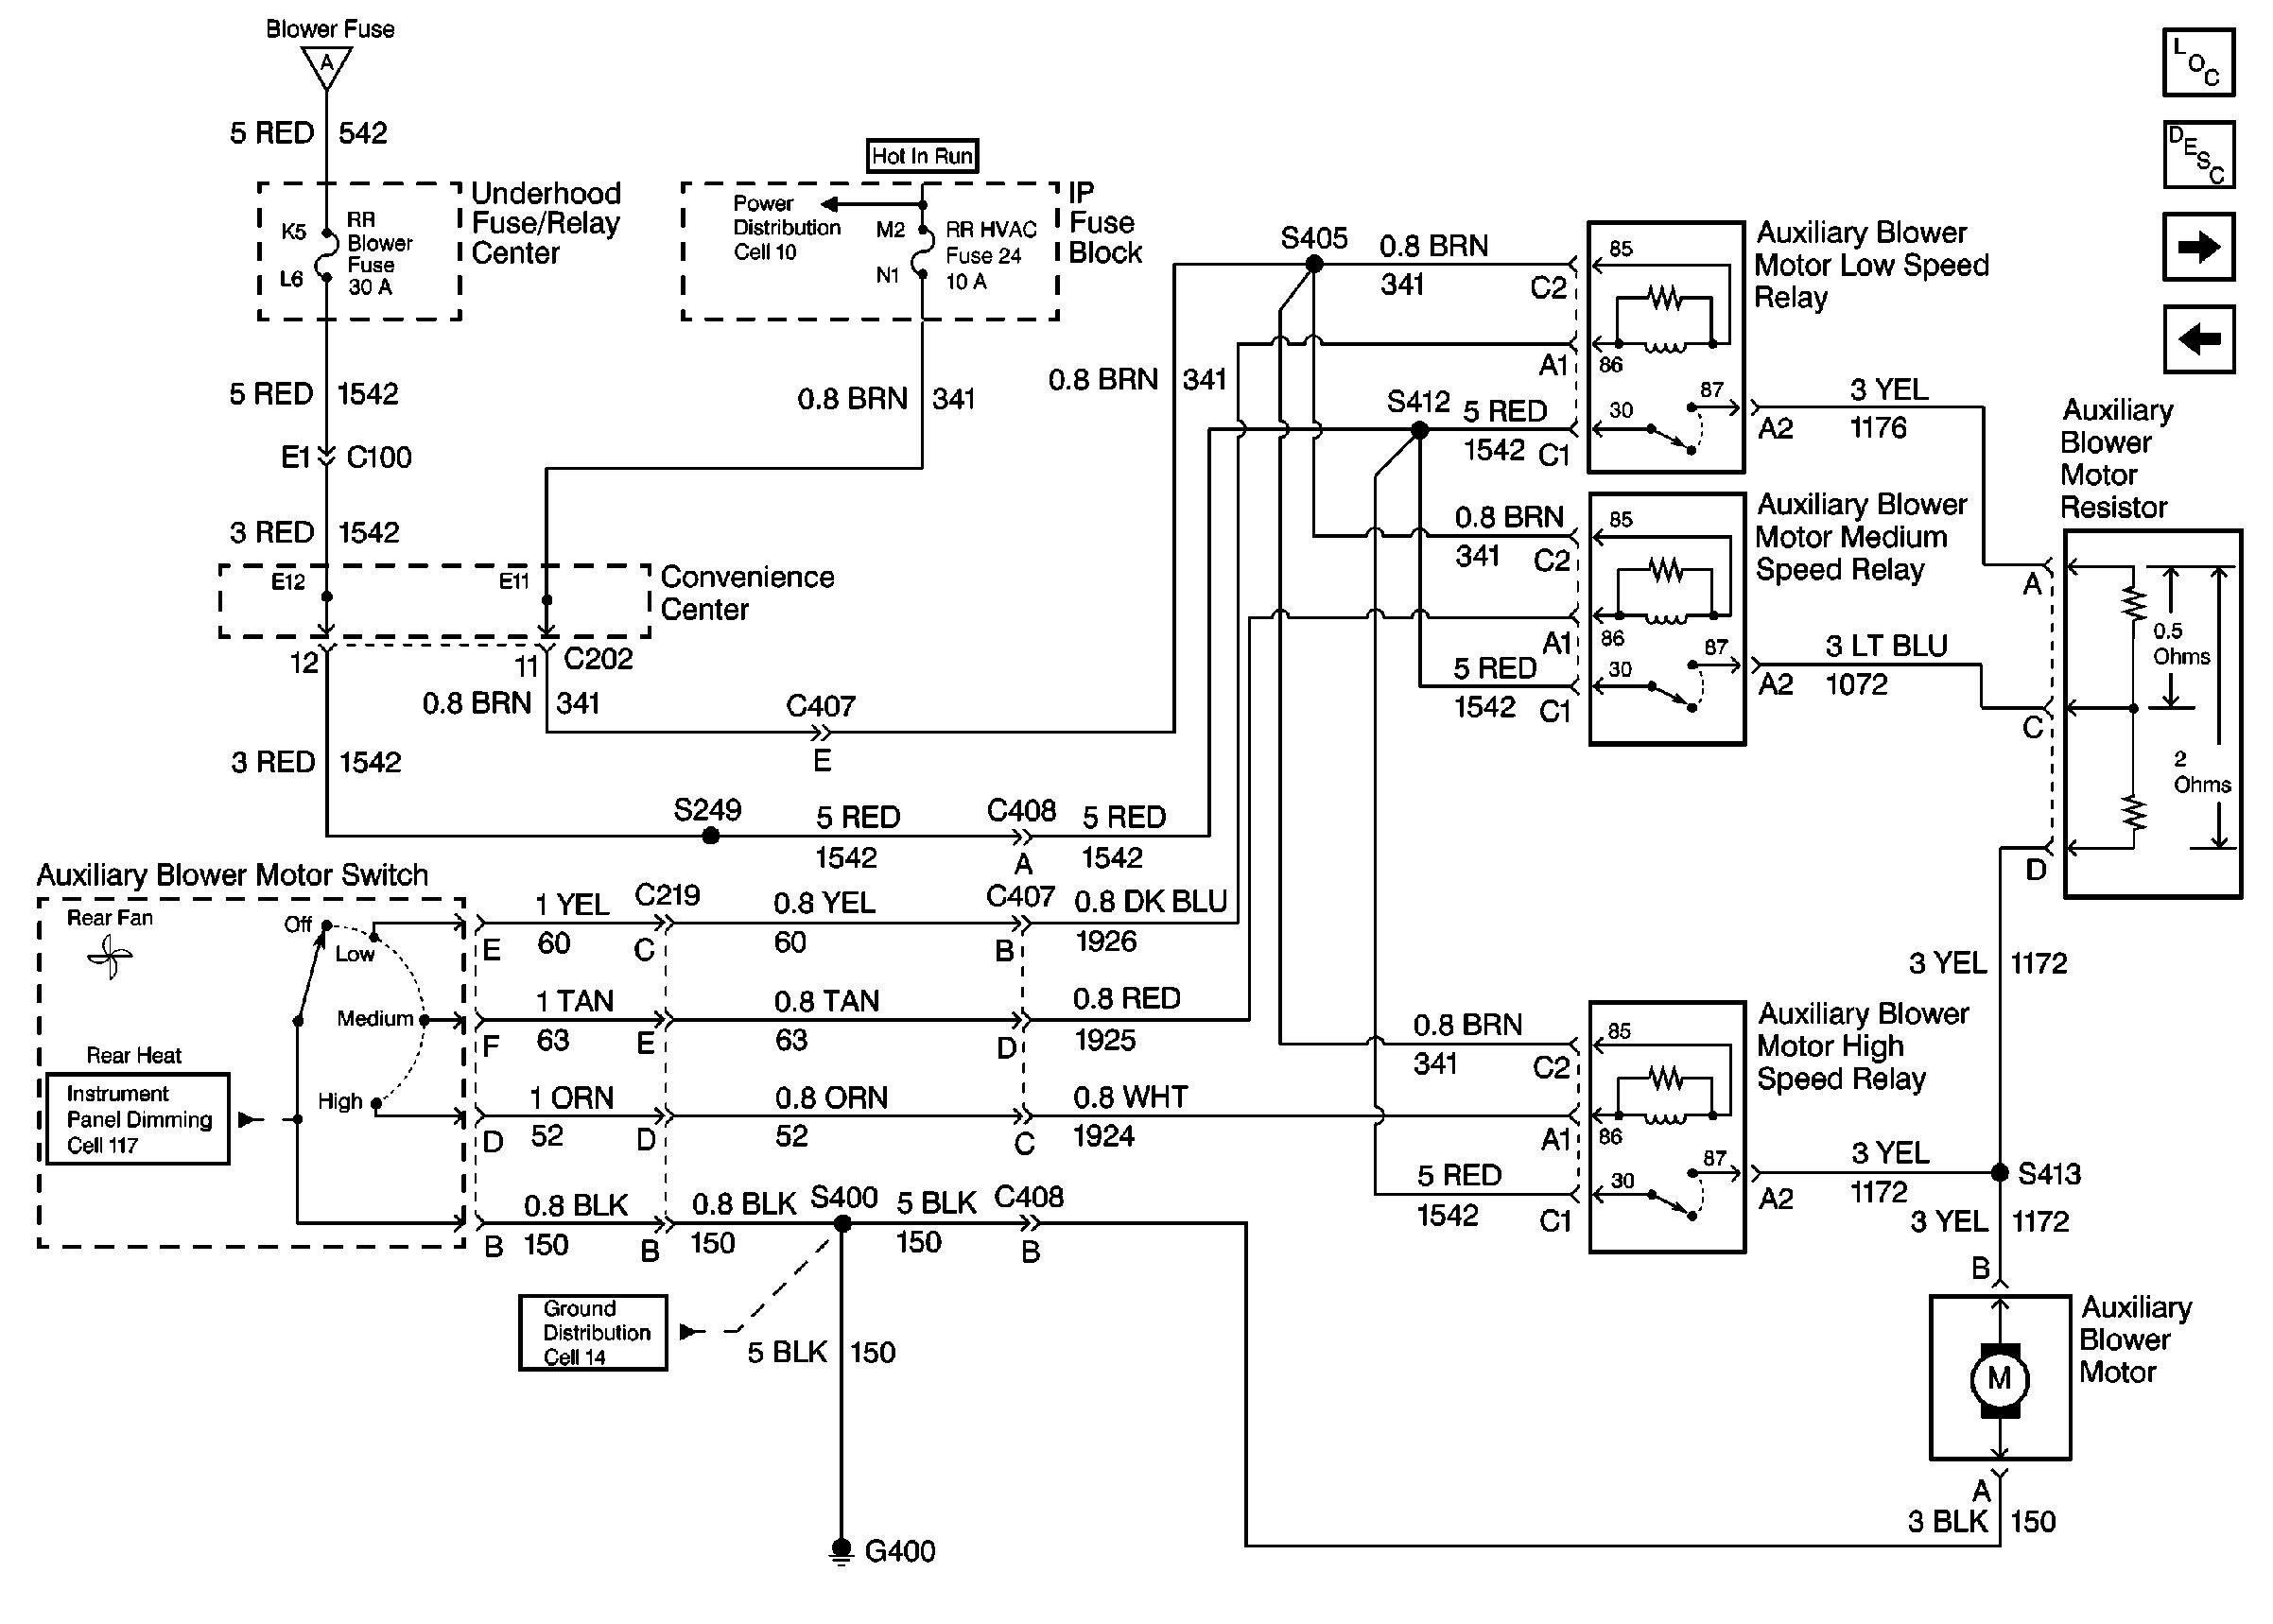 chevy express wiring diagram wiring diagram chevy colorado wiring-diagram 2012 chevy express wiring diagram #13